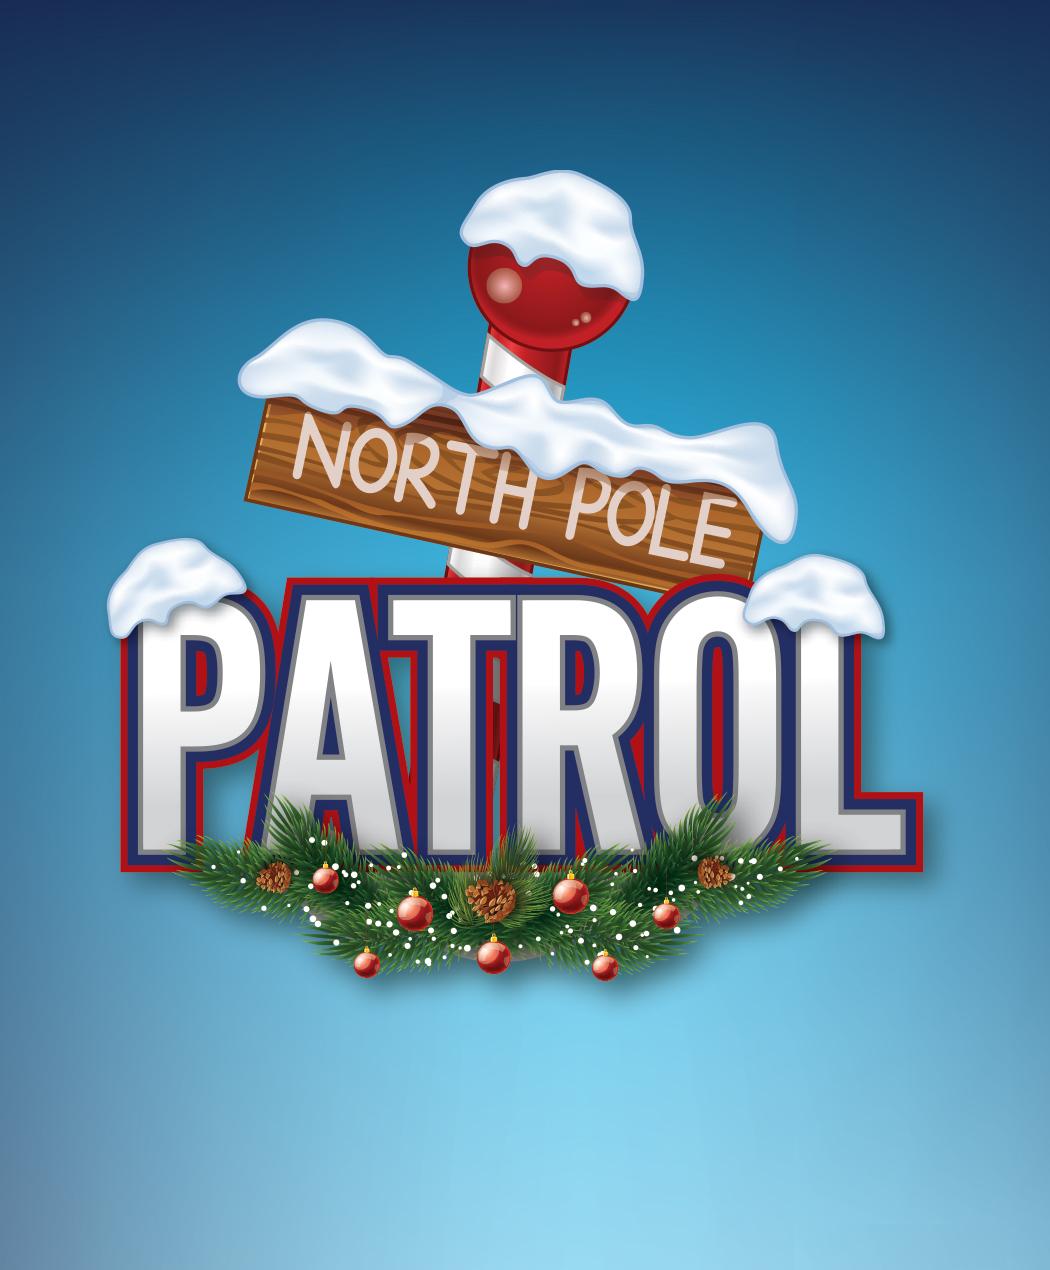 North Pole Prize Patrol